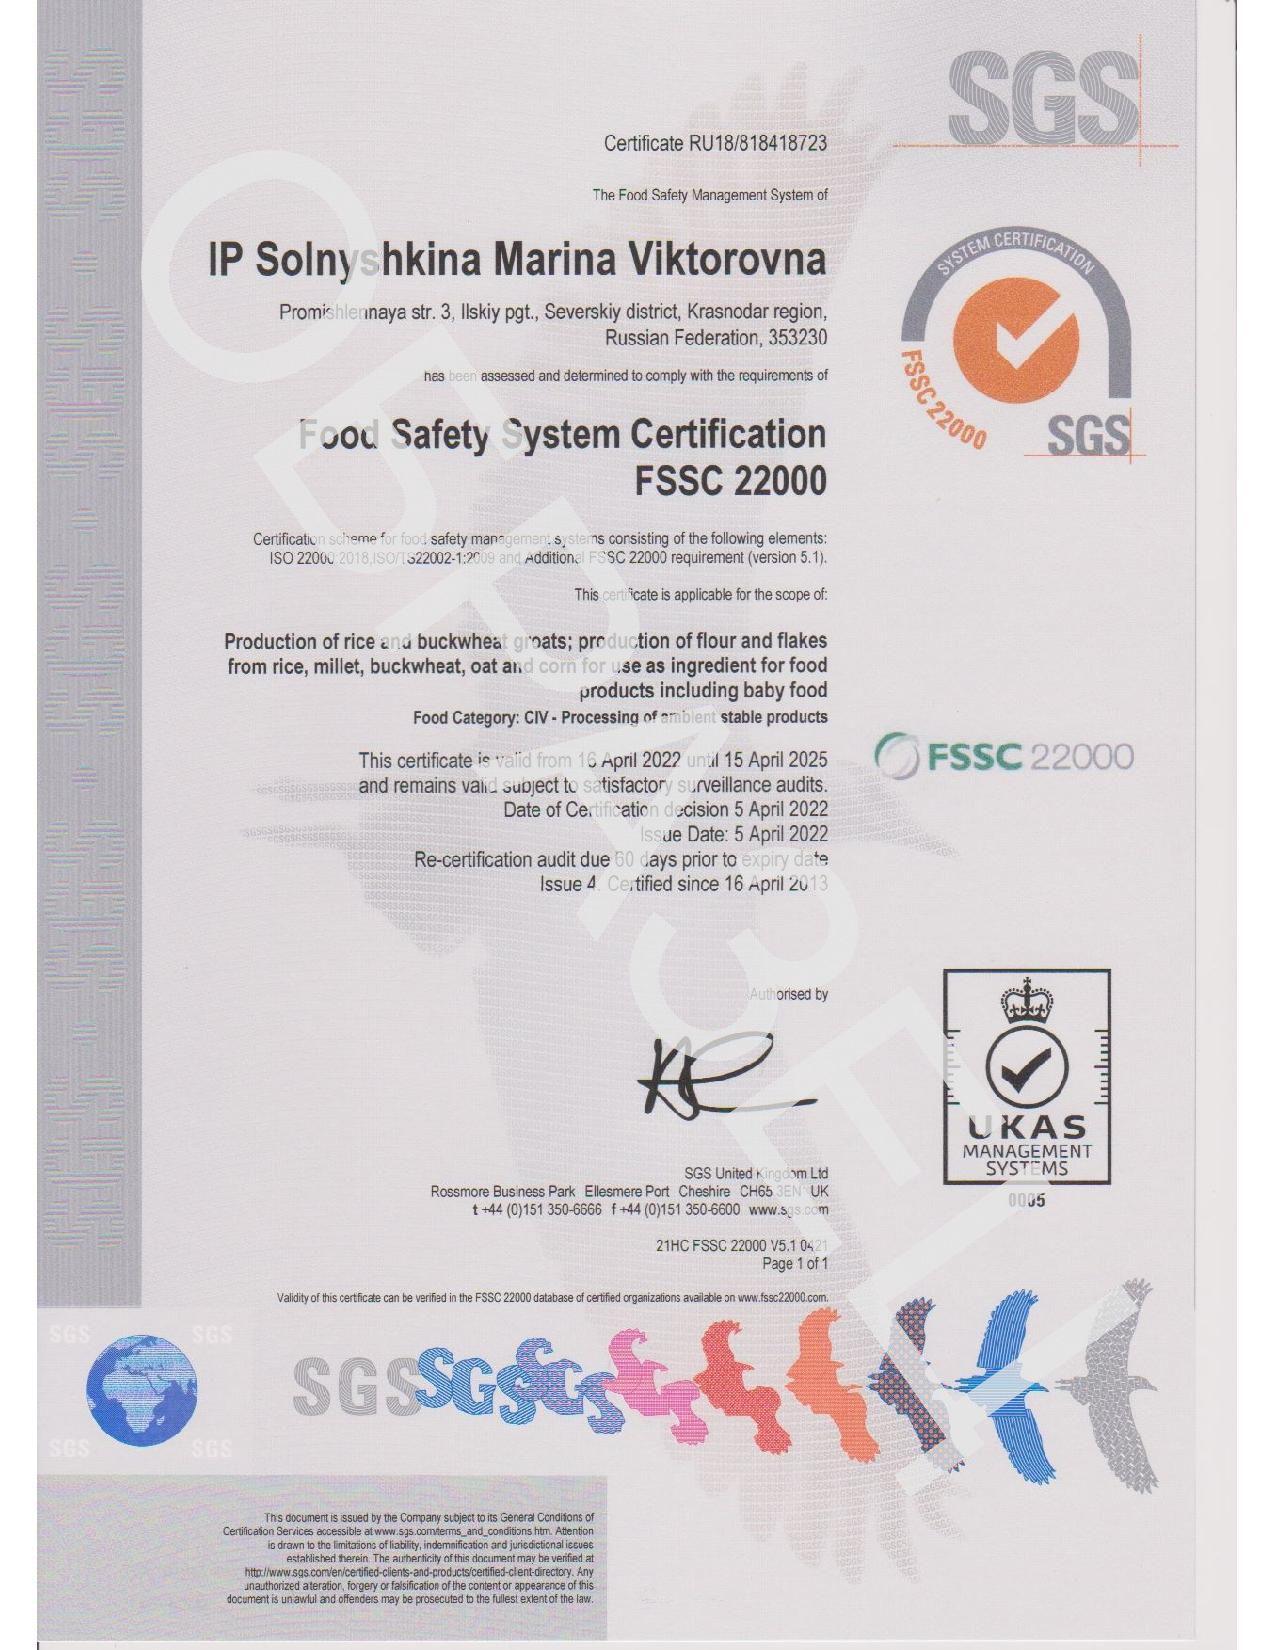 FOOD SAFETY SYSTEM CERTIFICATION (FSSC)